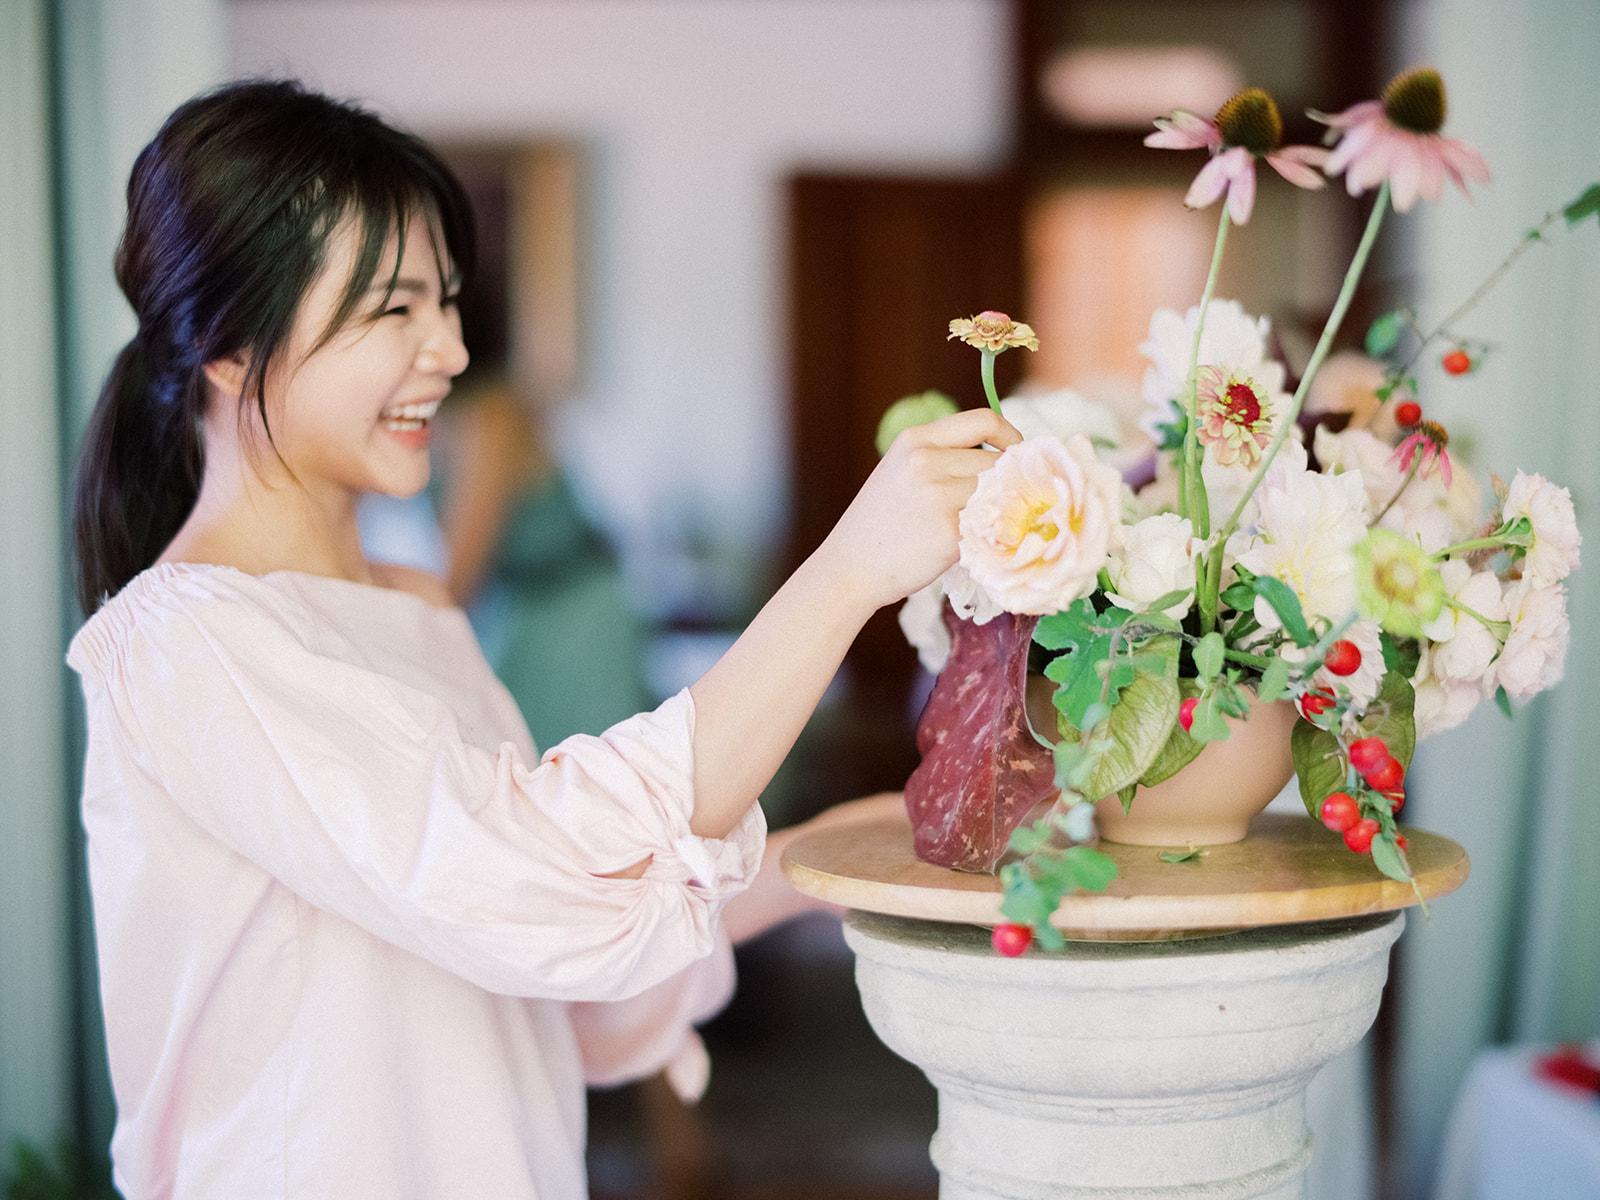 ha-tran-floral-designer-sydney-florist-wedding-florist-idyll-studio-3